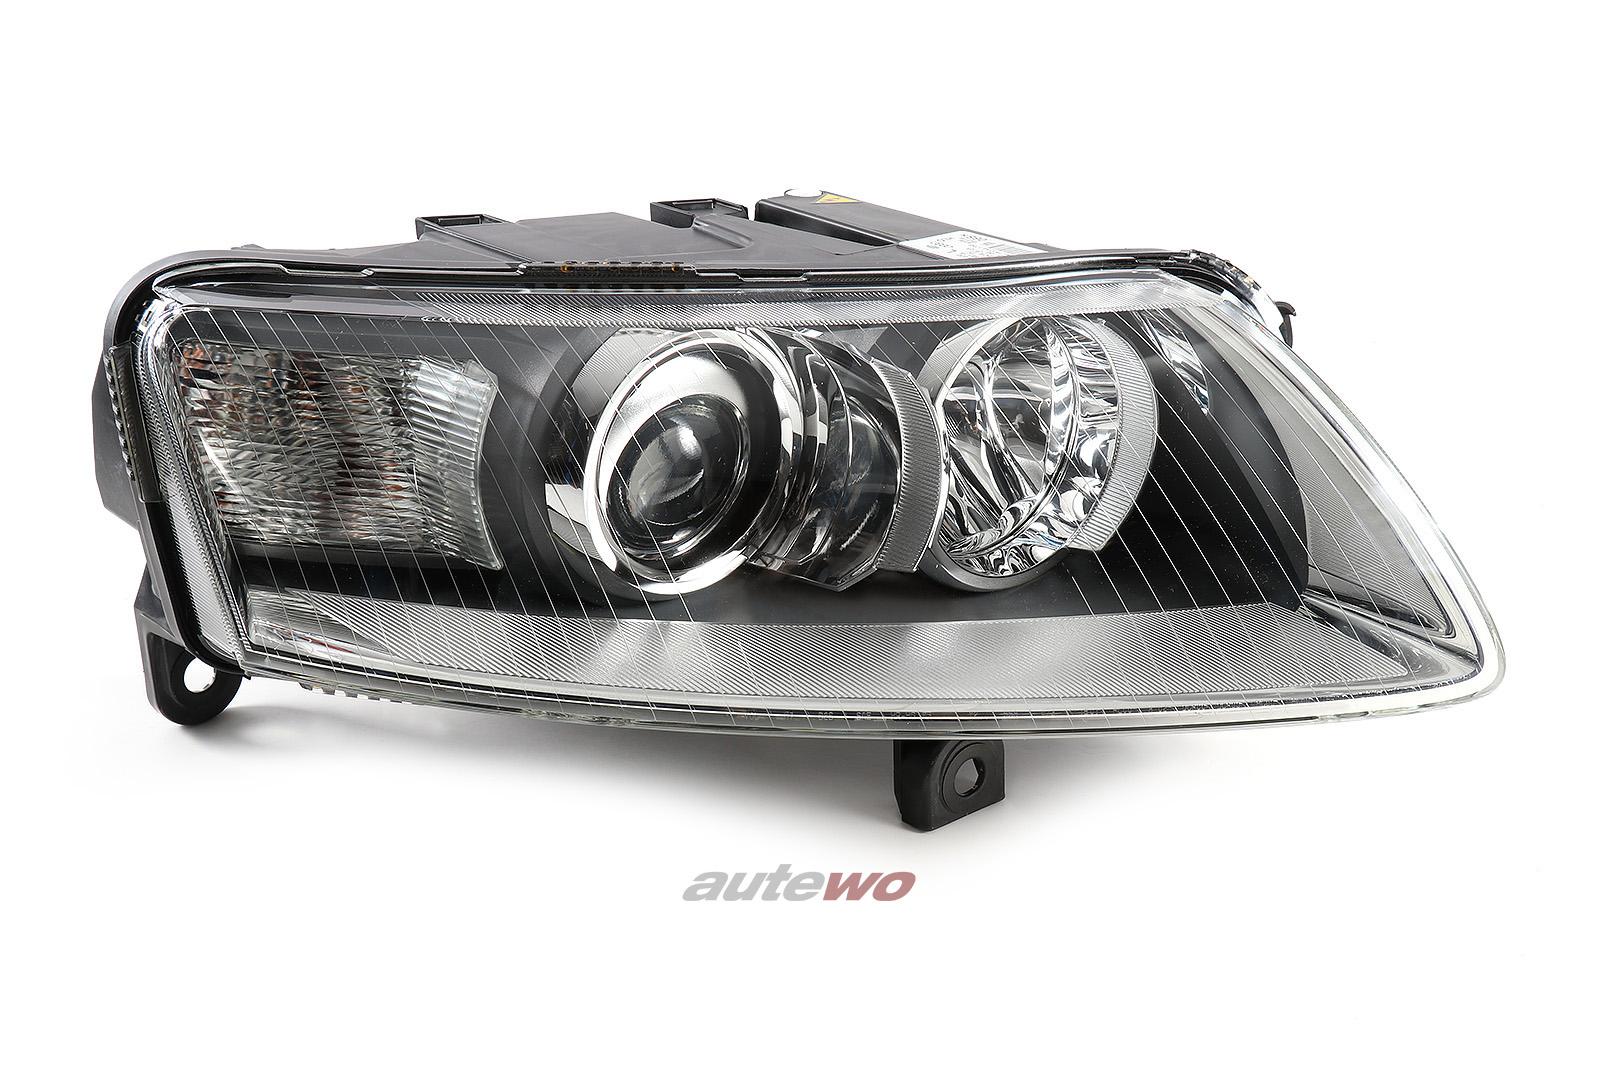 4F0941030AN/EC NEU&ORIGINAL Audi A6 4F Bi-Xenon-Scheinwerfer RHD Rechts